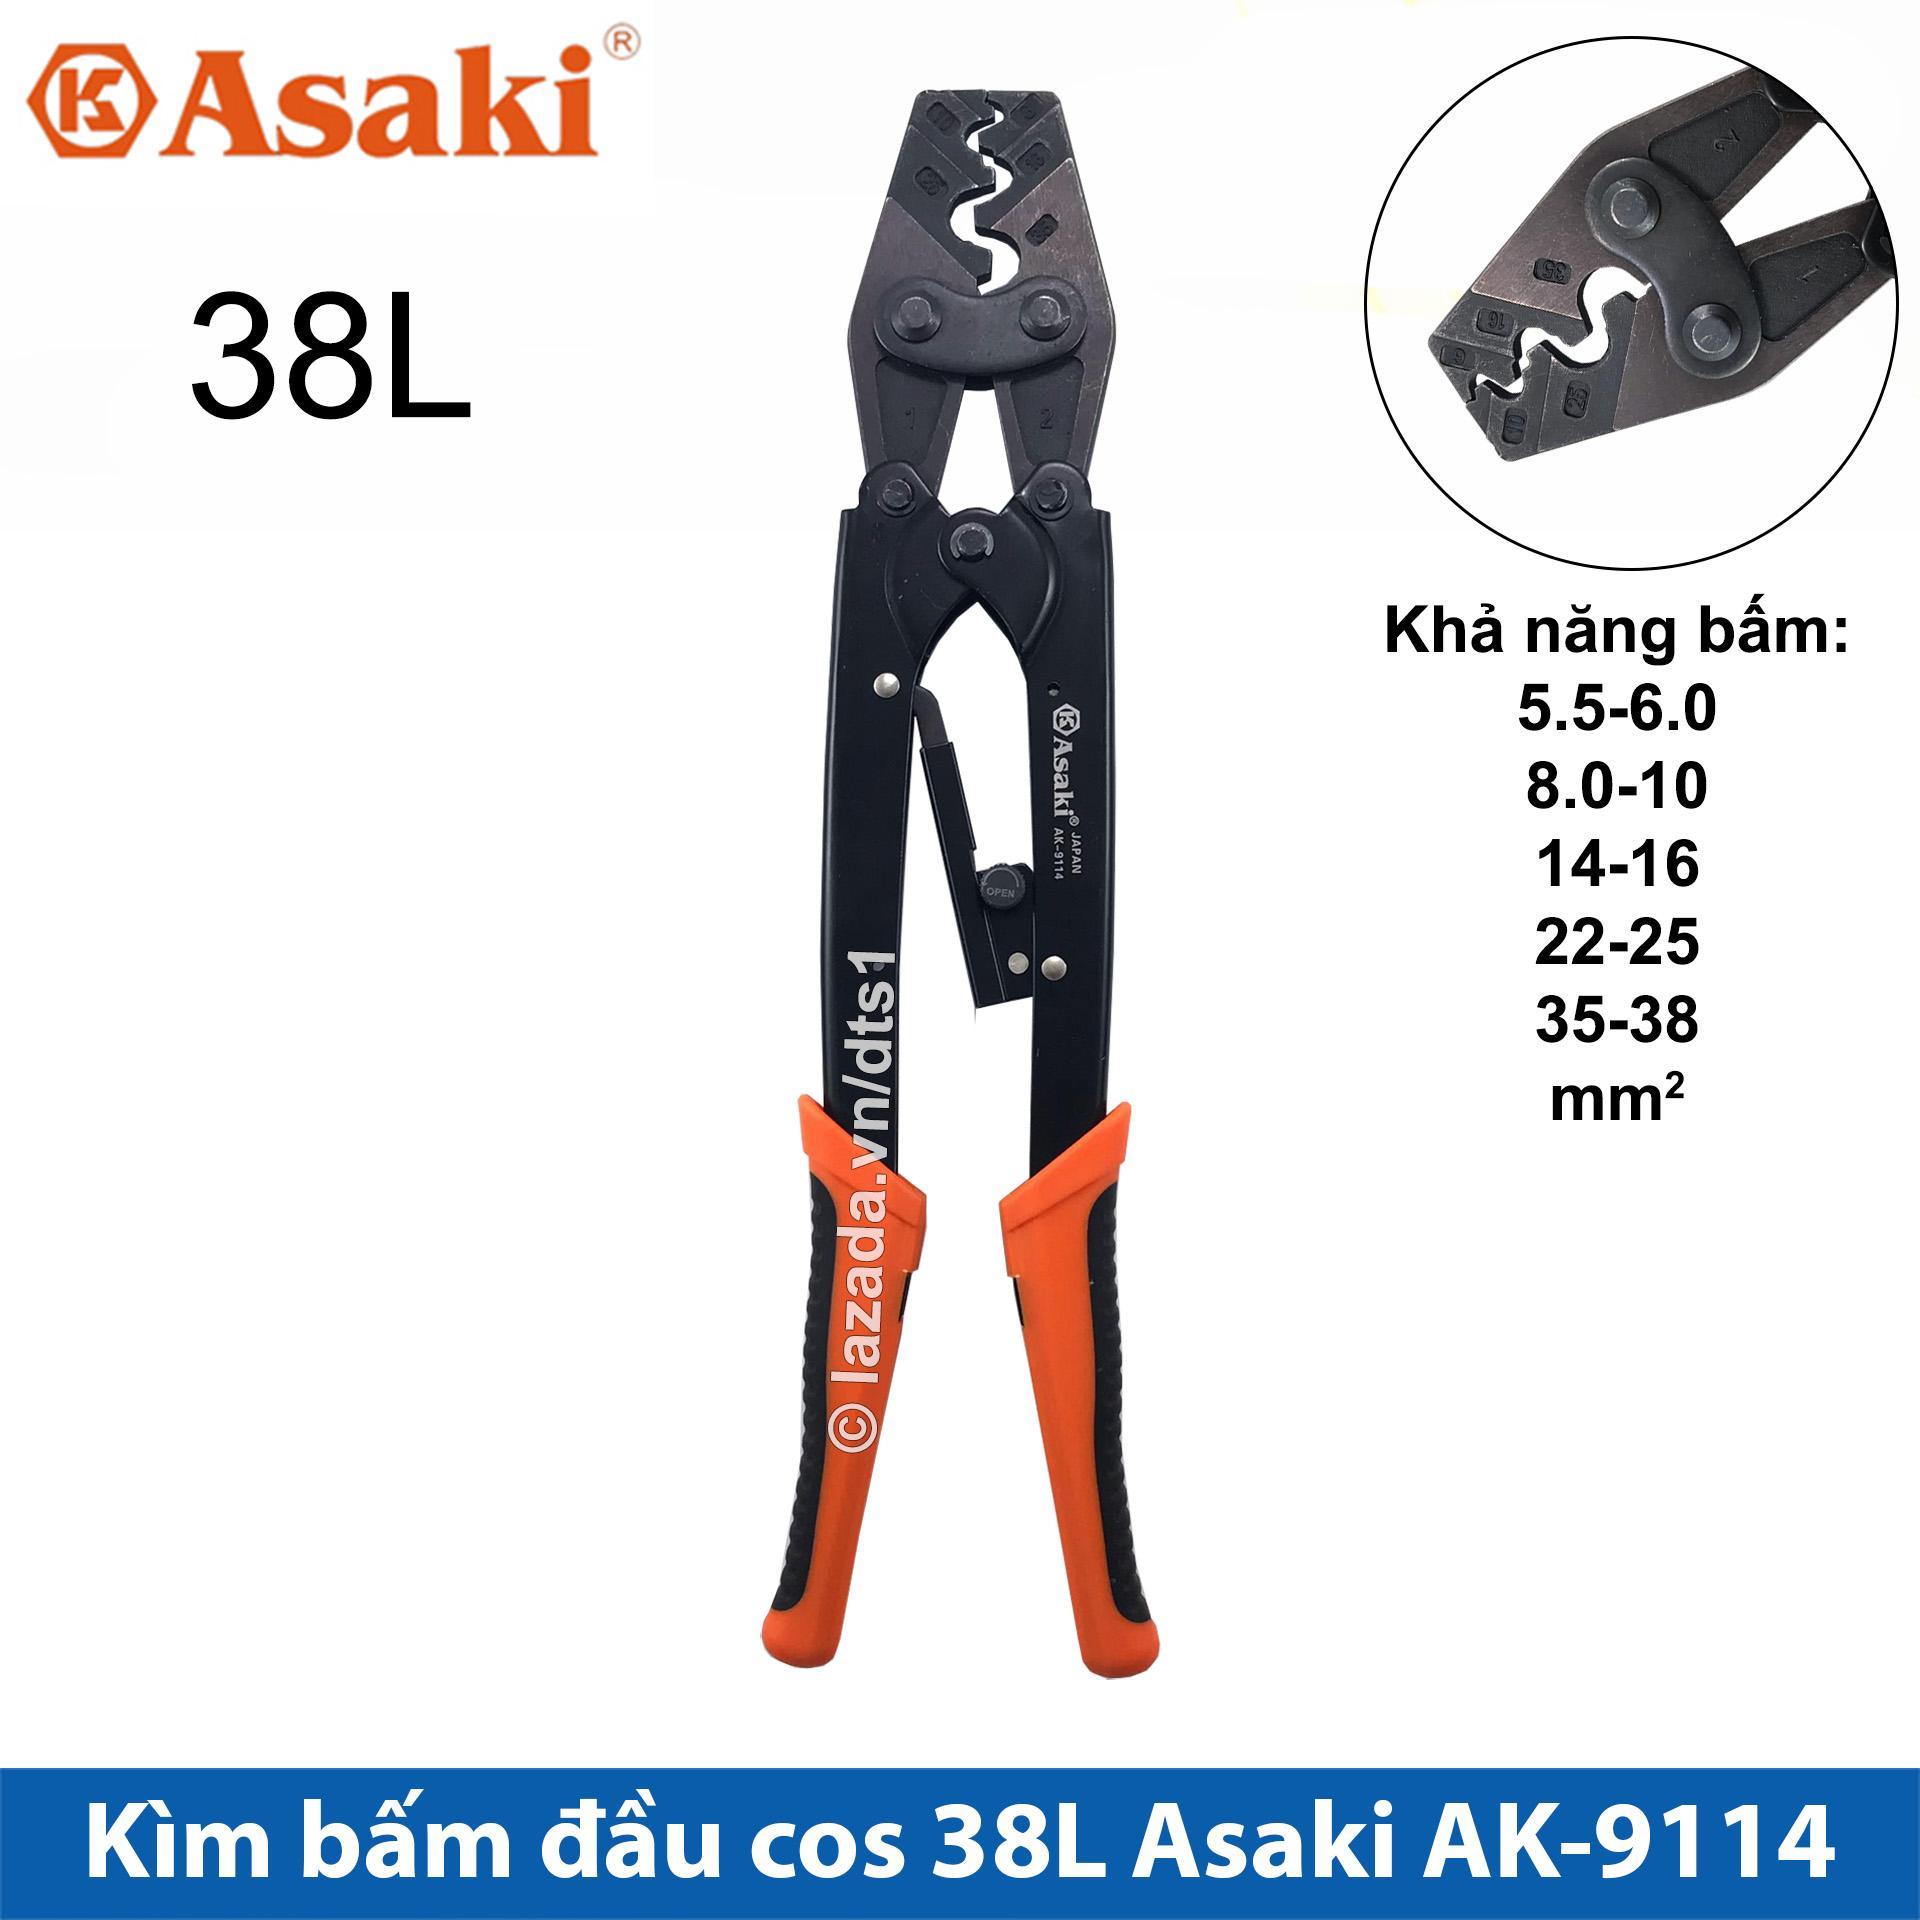 Kìm bấm cos 38L 5.5 -> 38mm2 Asaki AK-9114, Kềm bấm cốt 38L (Kìm bấm đầu cote Asaki)